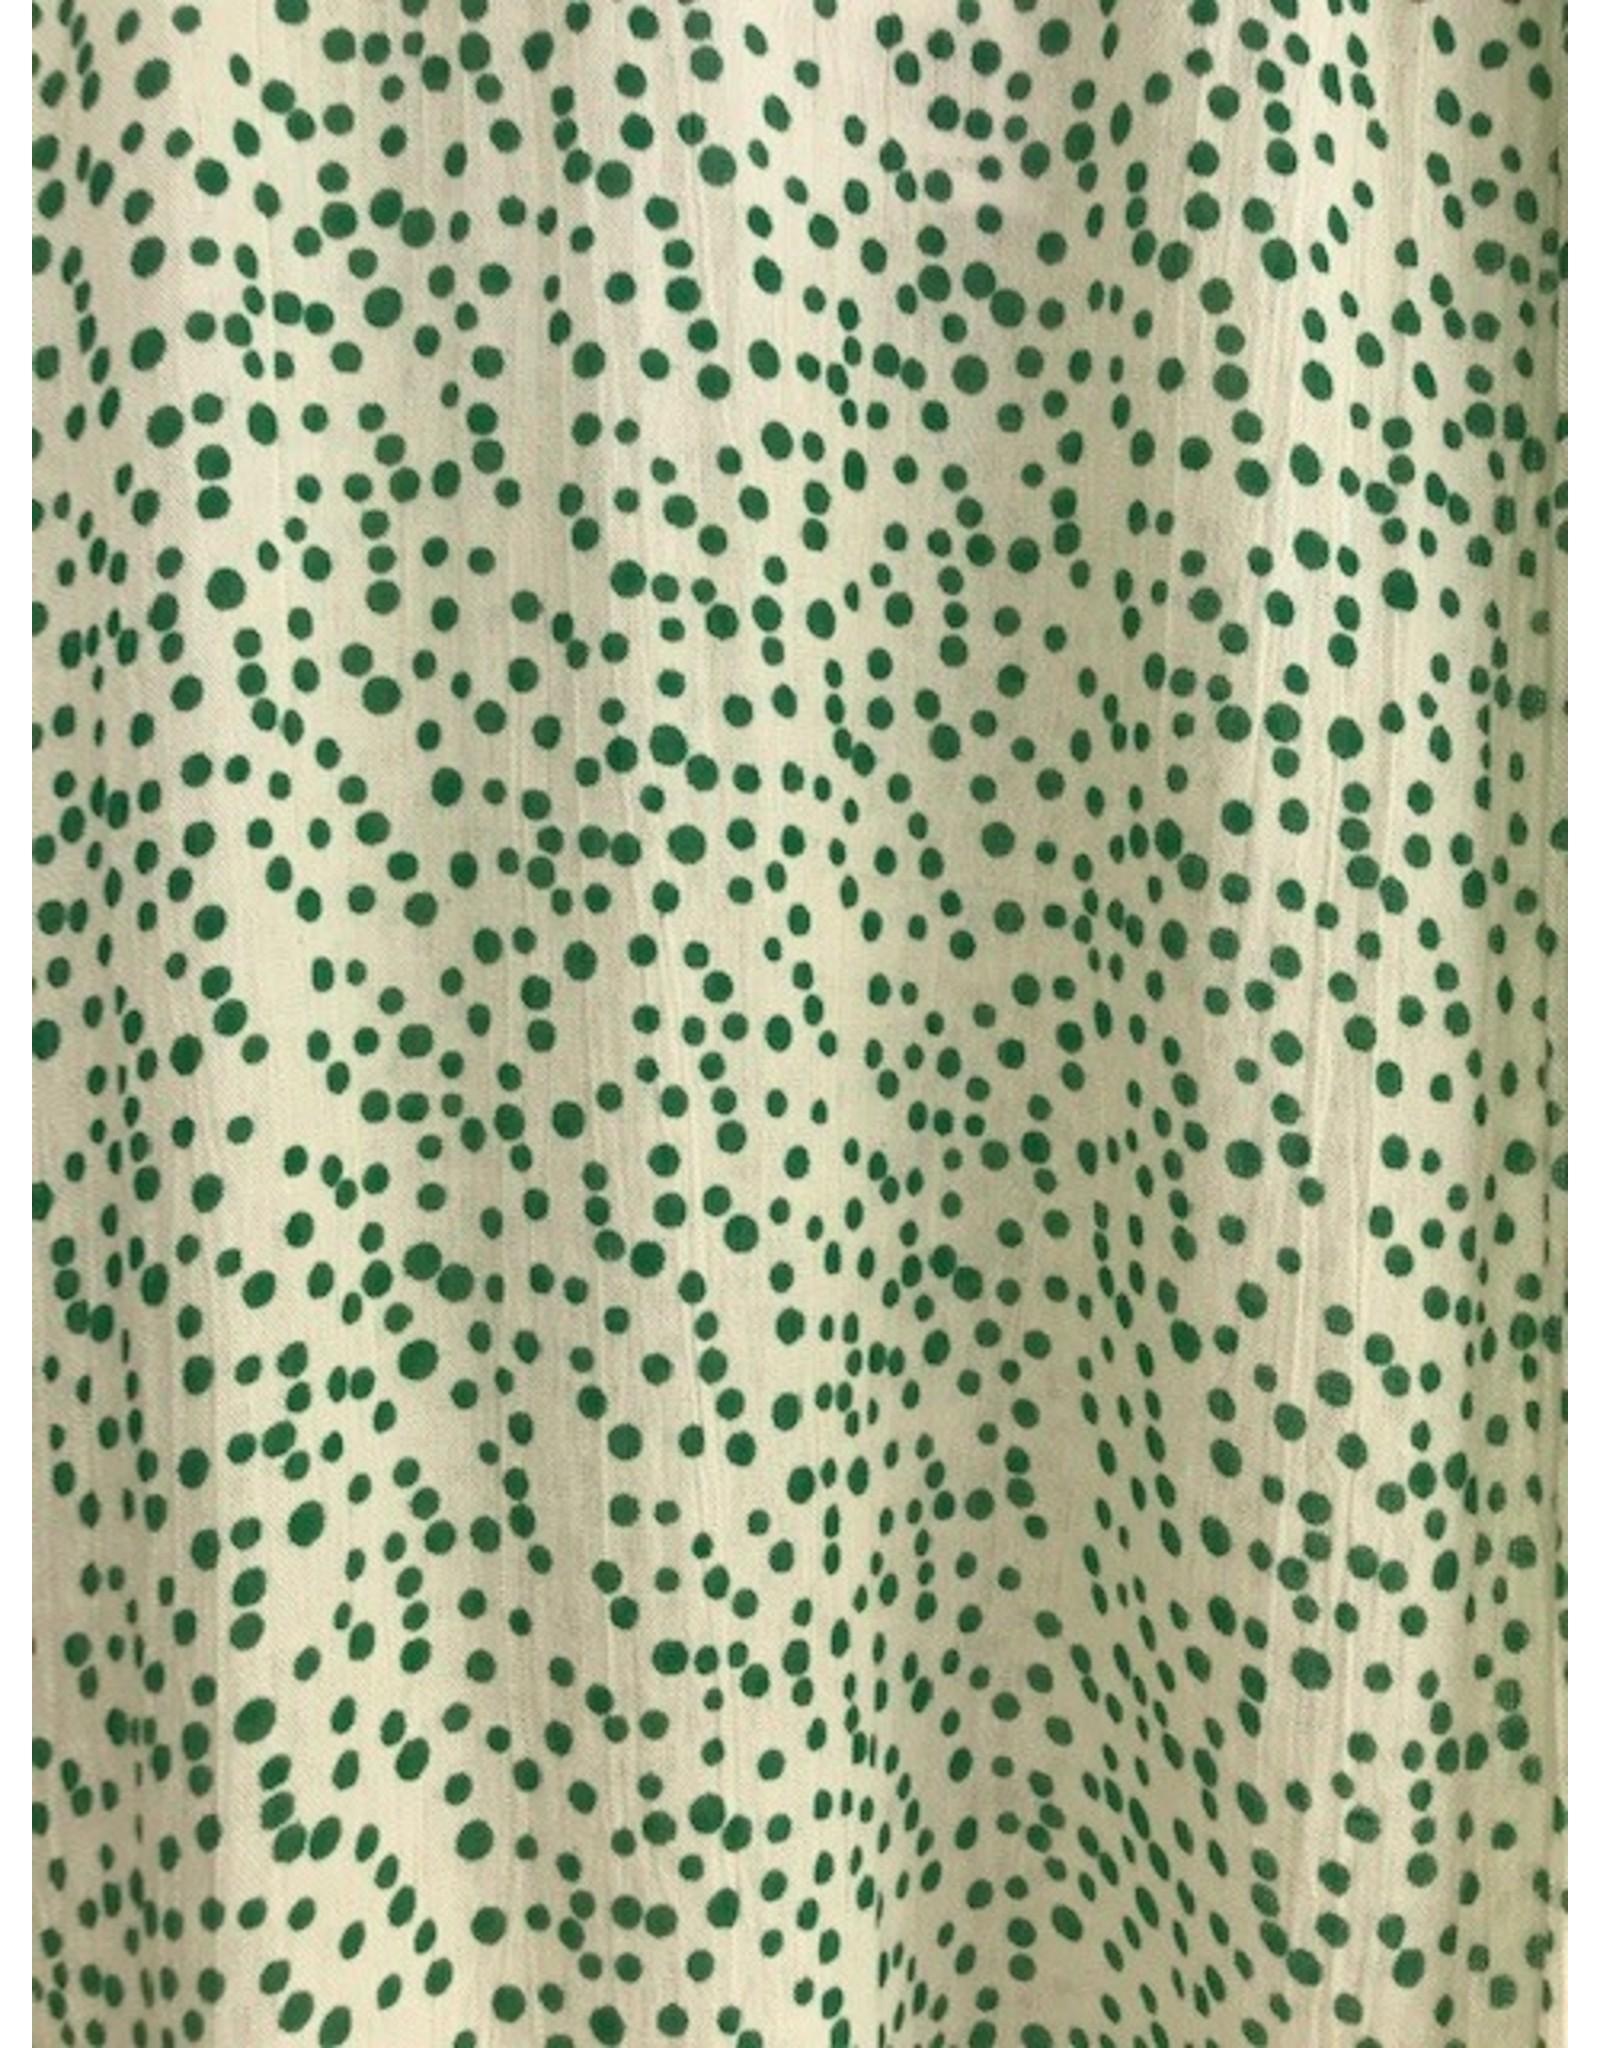 Compania Fantastica Compania Fantastica - Green dotted top